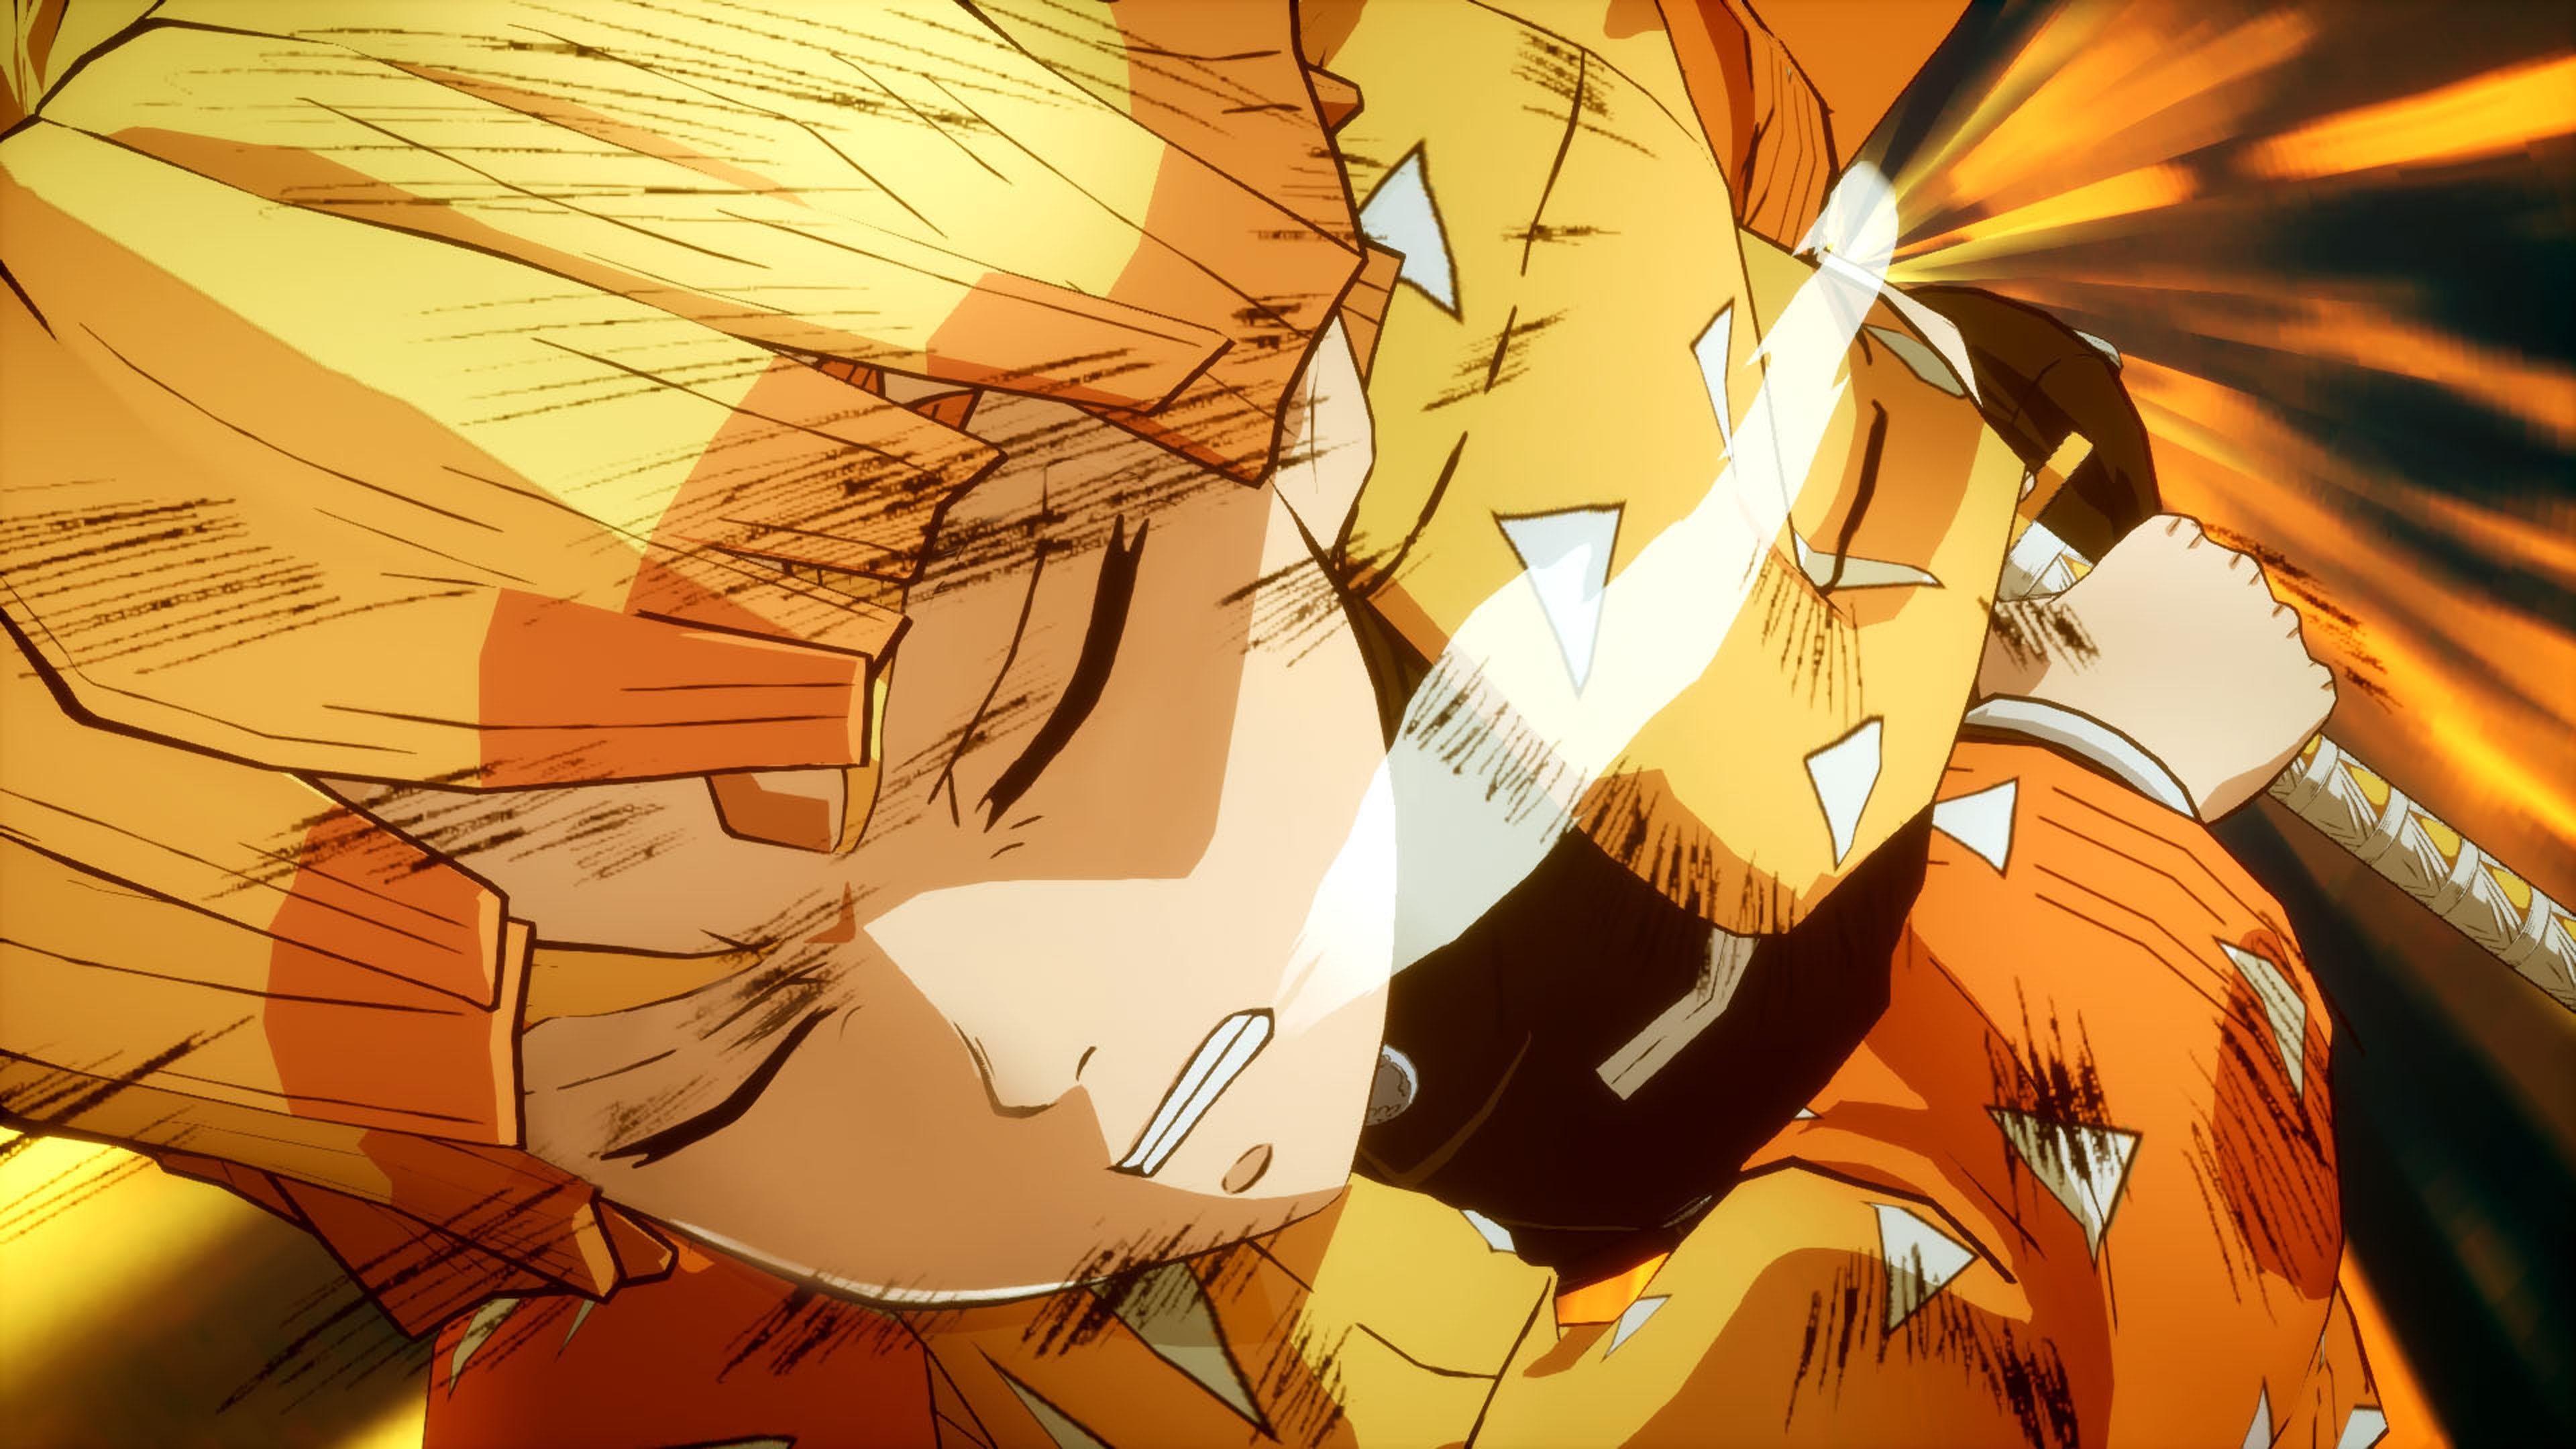 Скриншот №5 к Demon Slayer -Kimetsu no Yaiba- The Hinokami Chronicles Deluxe Edition PS4 and PS5